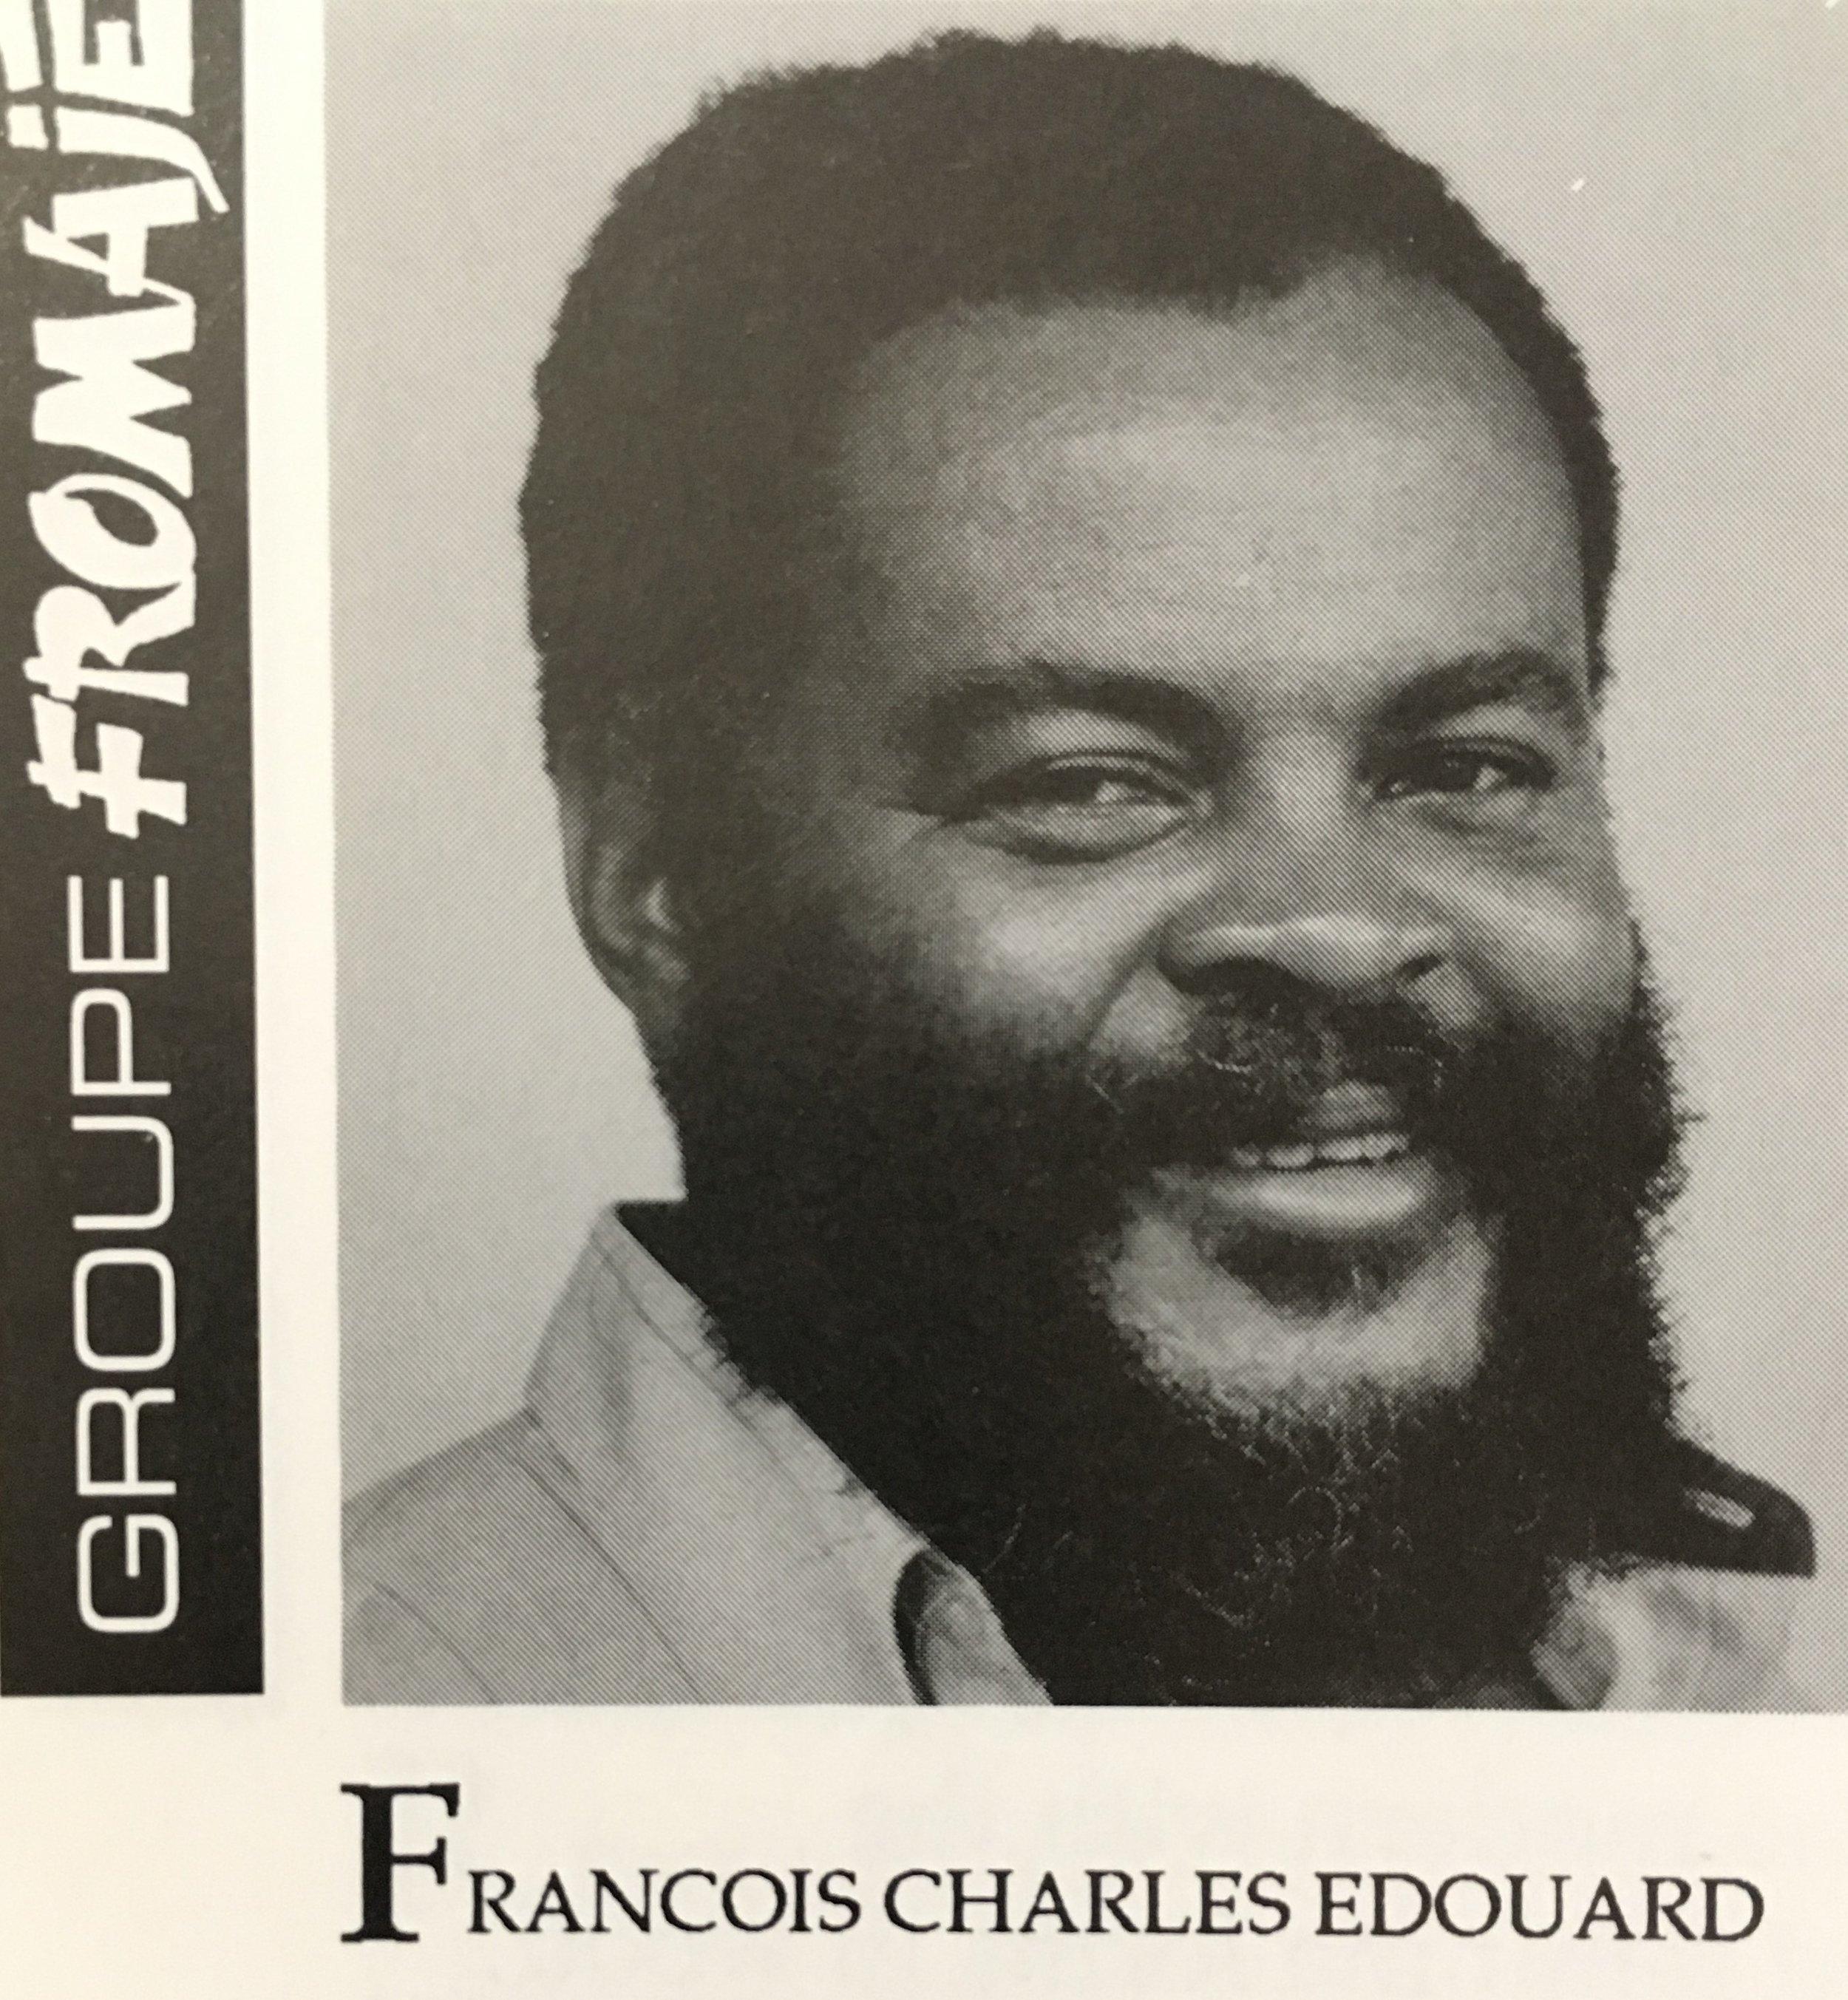 Edouard-Francois_Charles.jpg